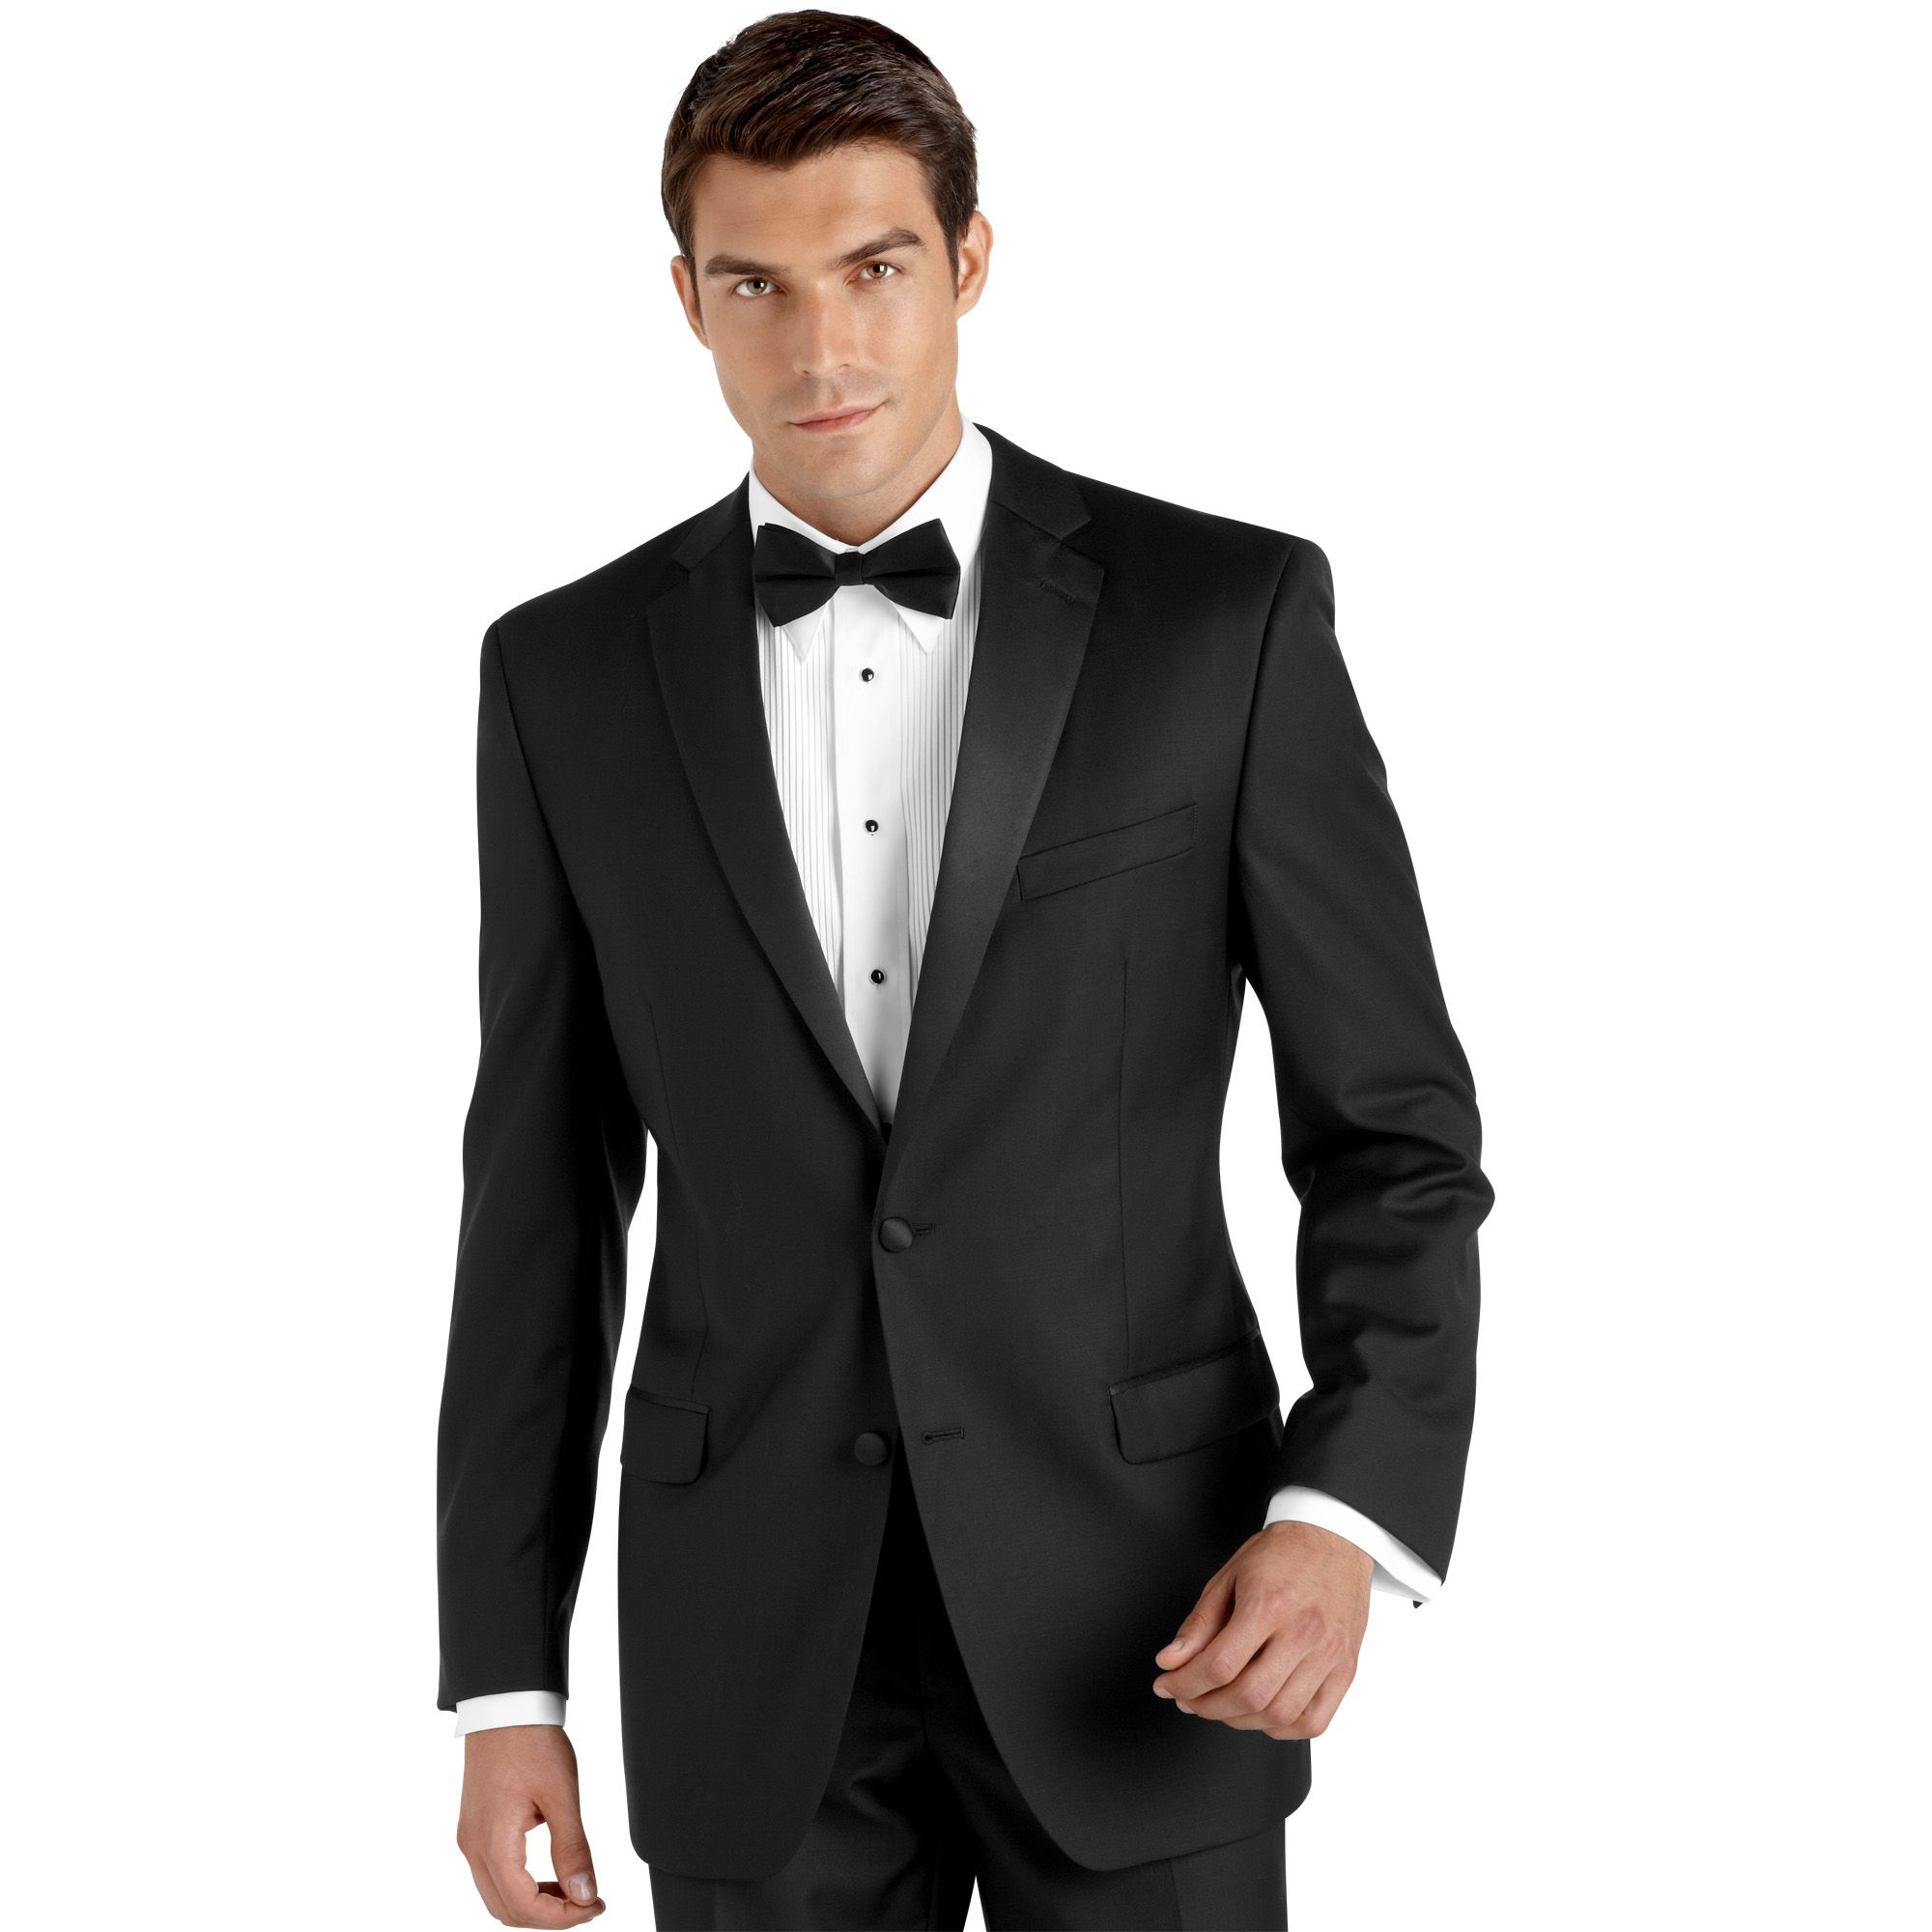 Tuxedos For Weddings: Groom's Tuxedo - - Mens Wearhouse